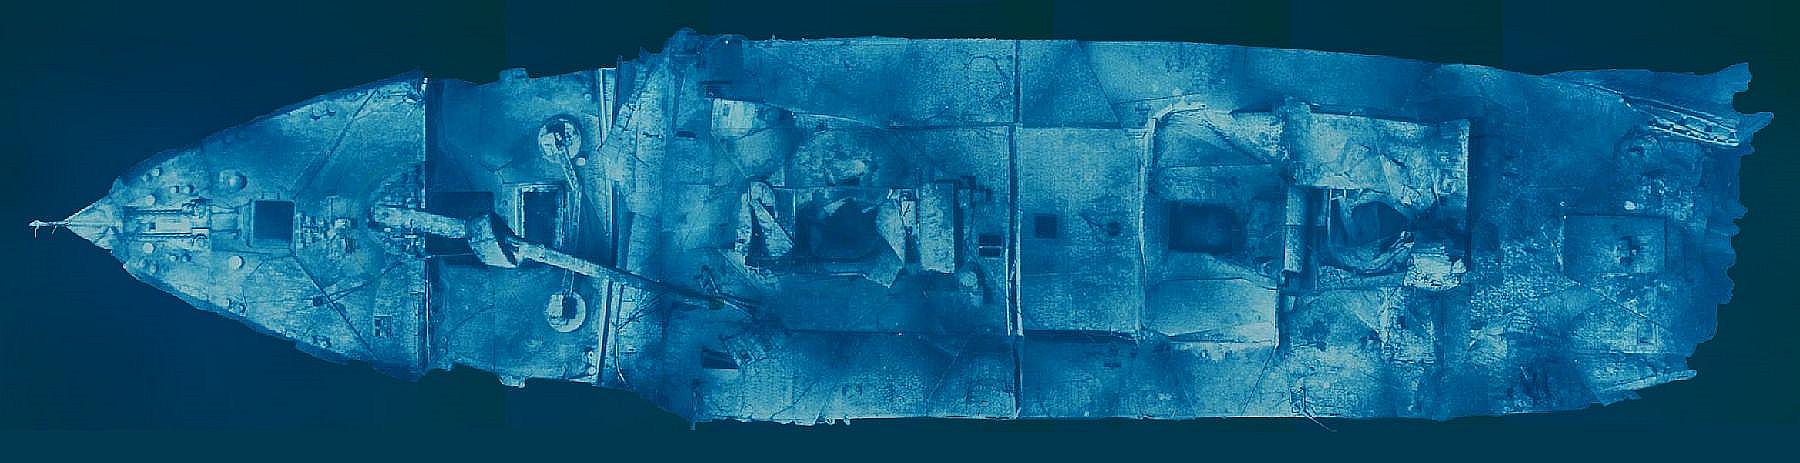 Titanic_Wreckage (5).jpg